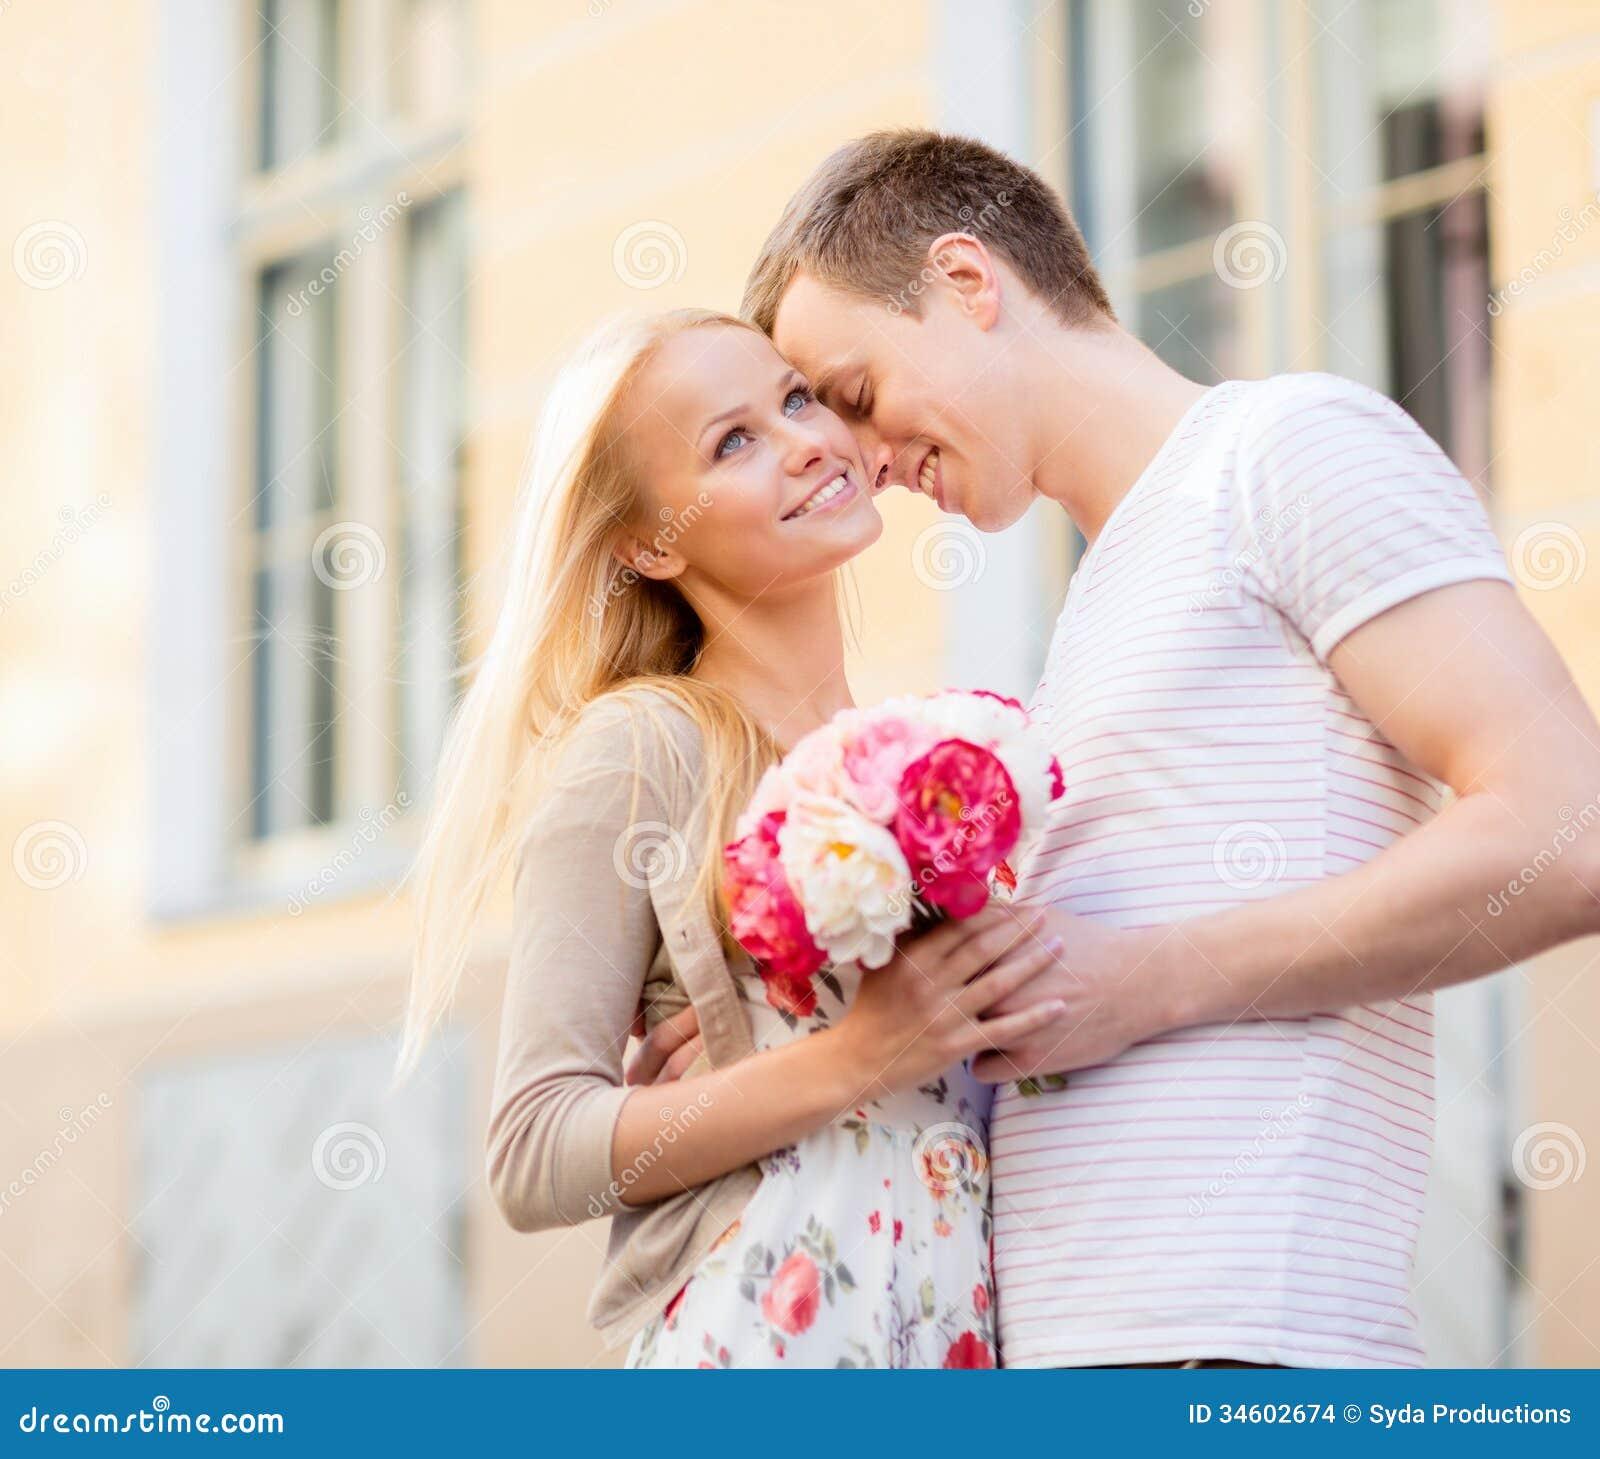 5'7 online dating